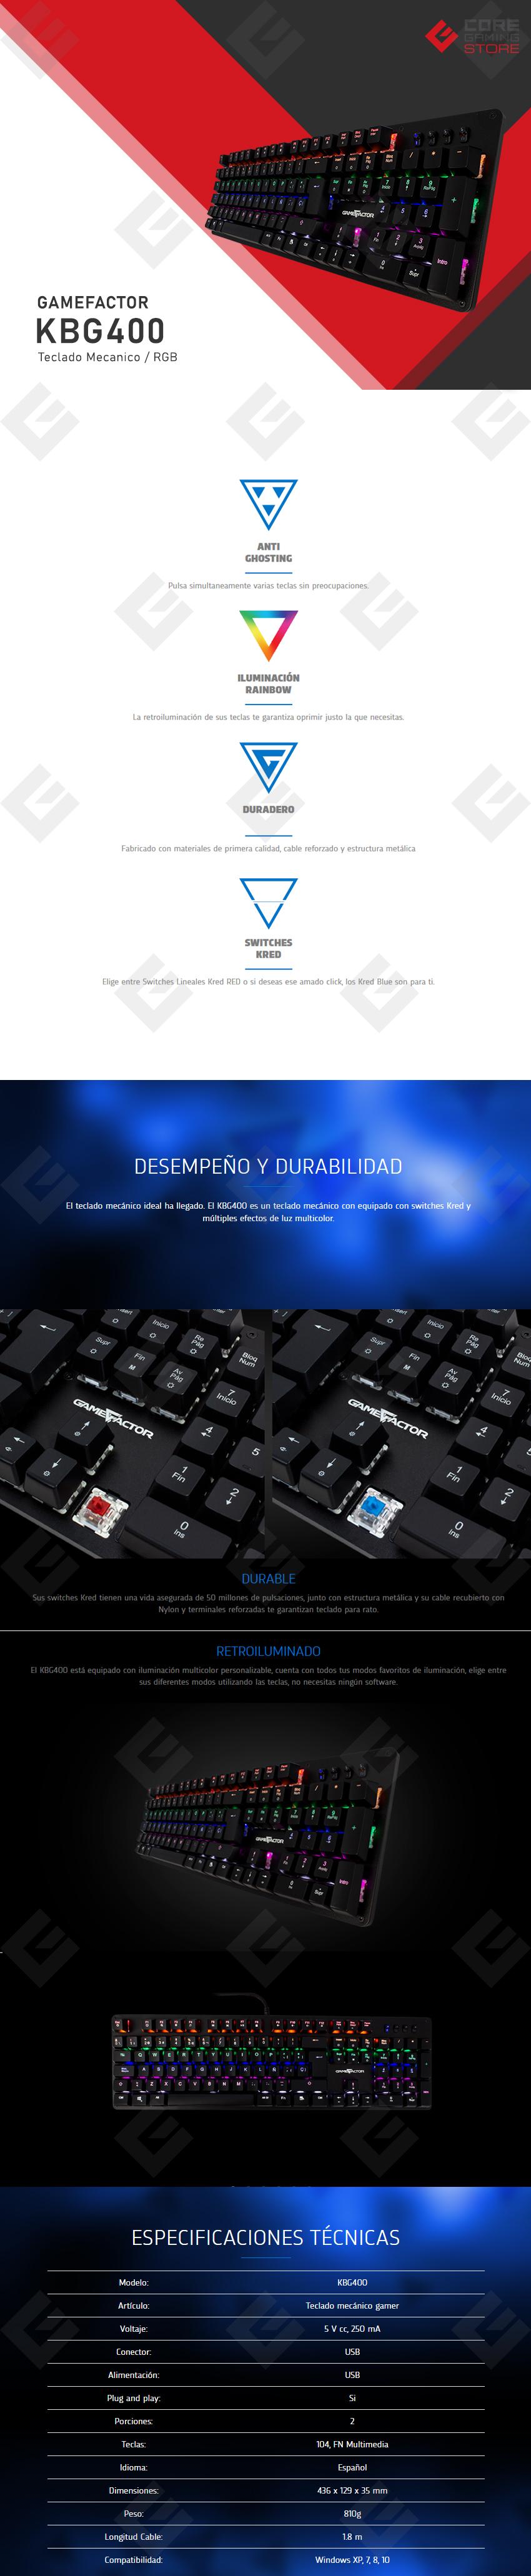 Teclado Mecanico GameFactor KBG400, Retroiluminado, Switch Red, USB, Negro - KBG400-RD